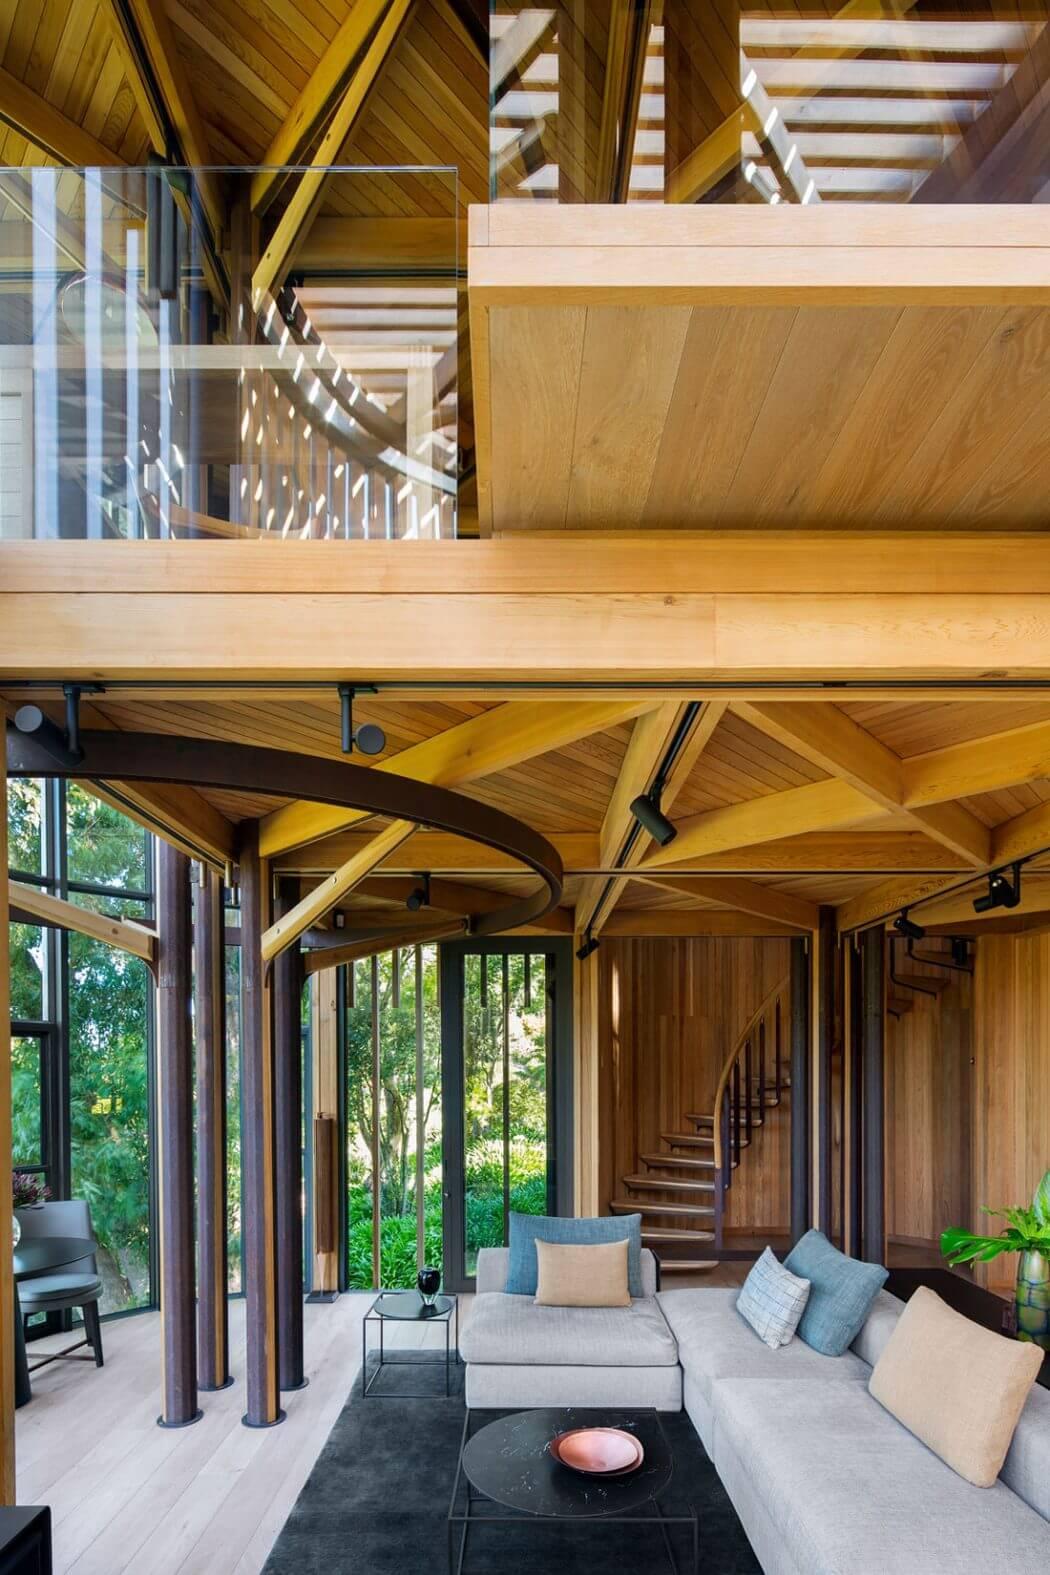 iGNANT_Architecture_Tree_House_Malan_Vorster_3